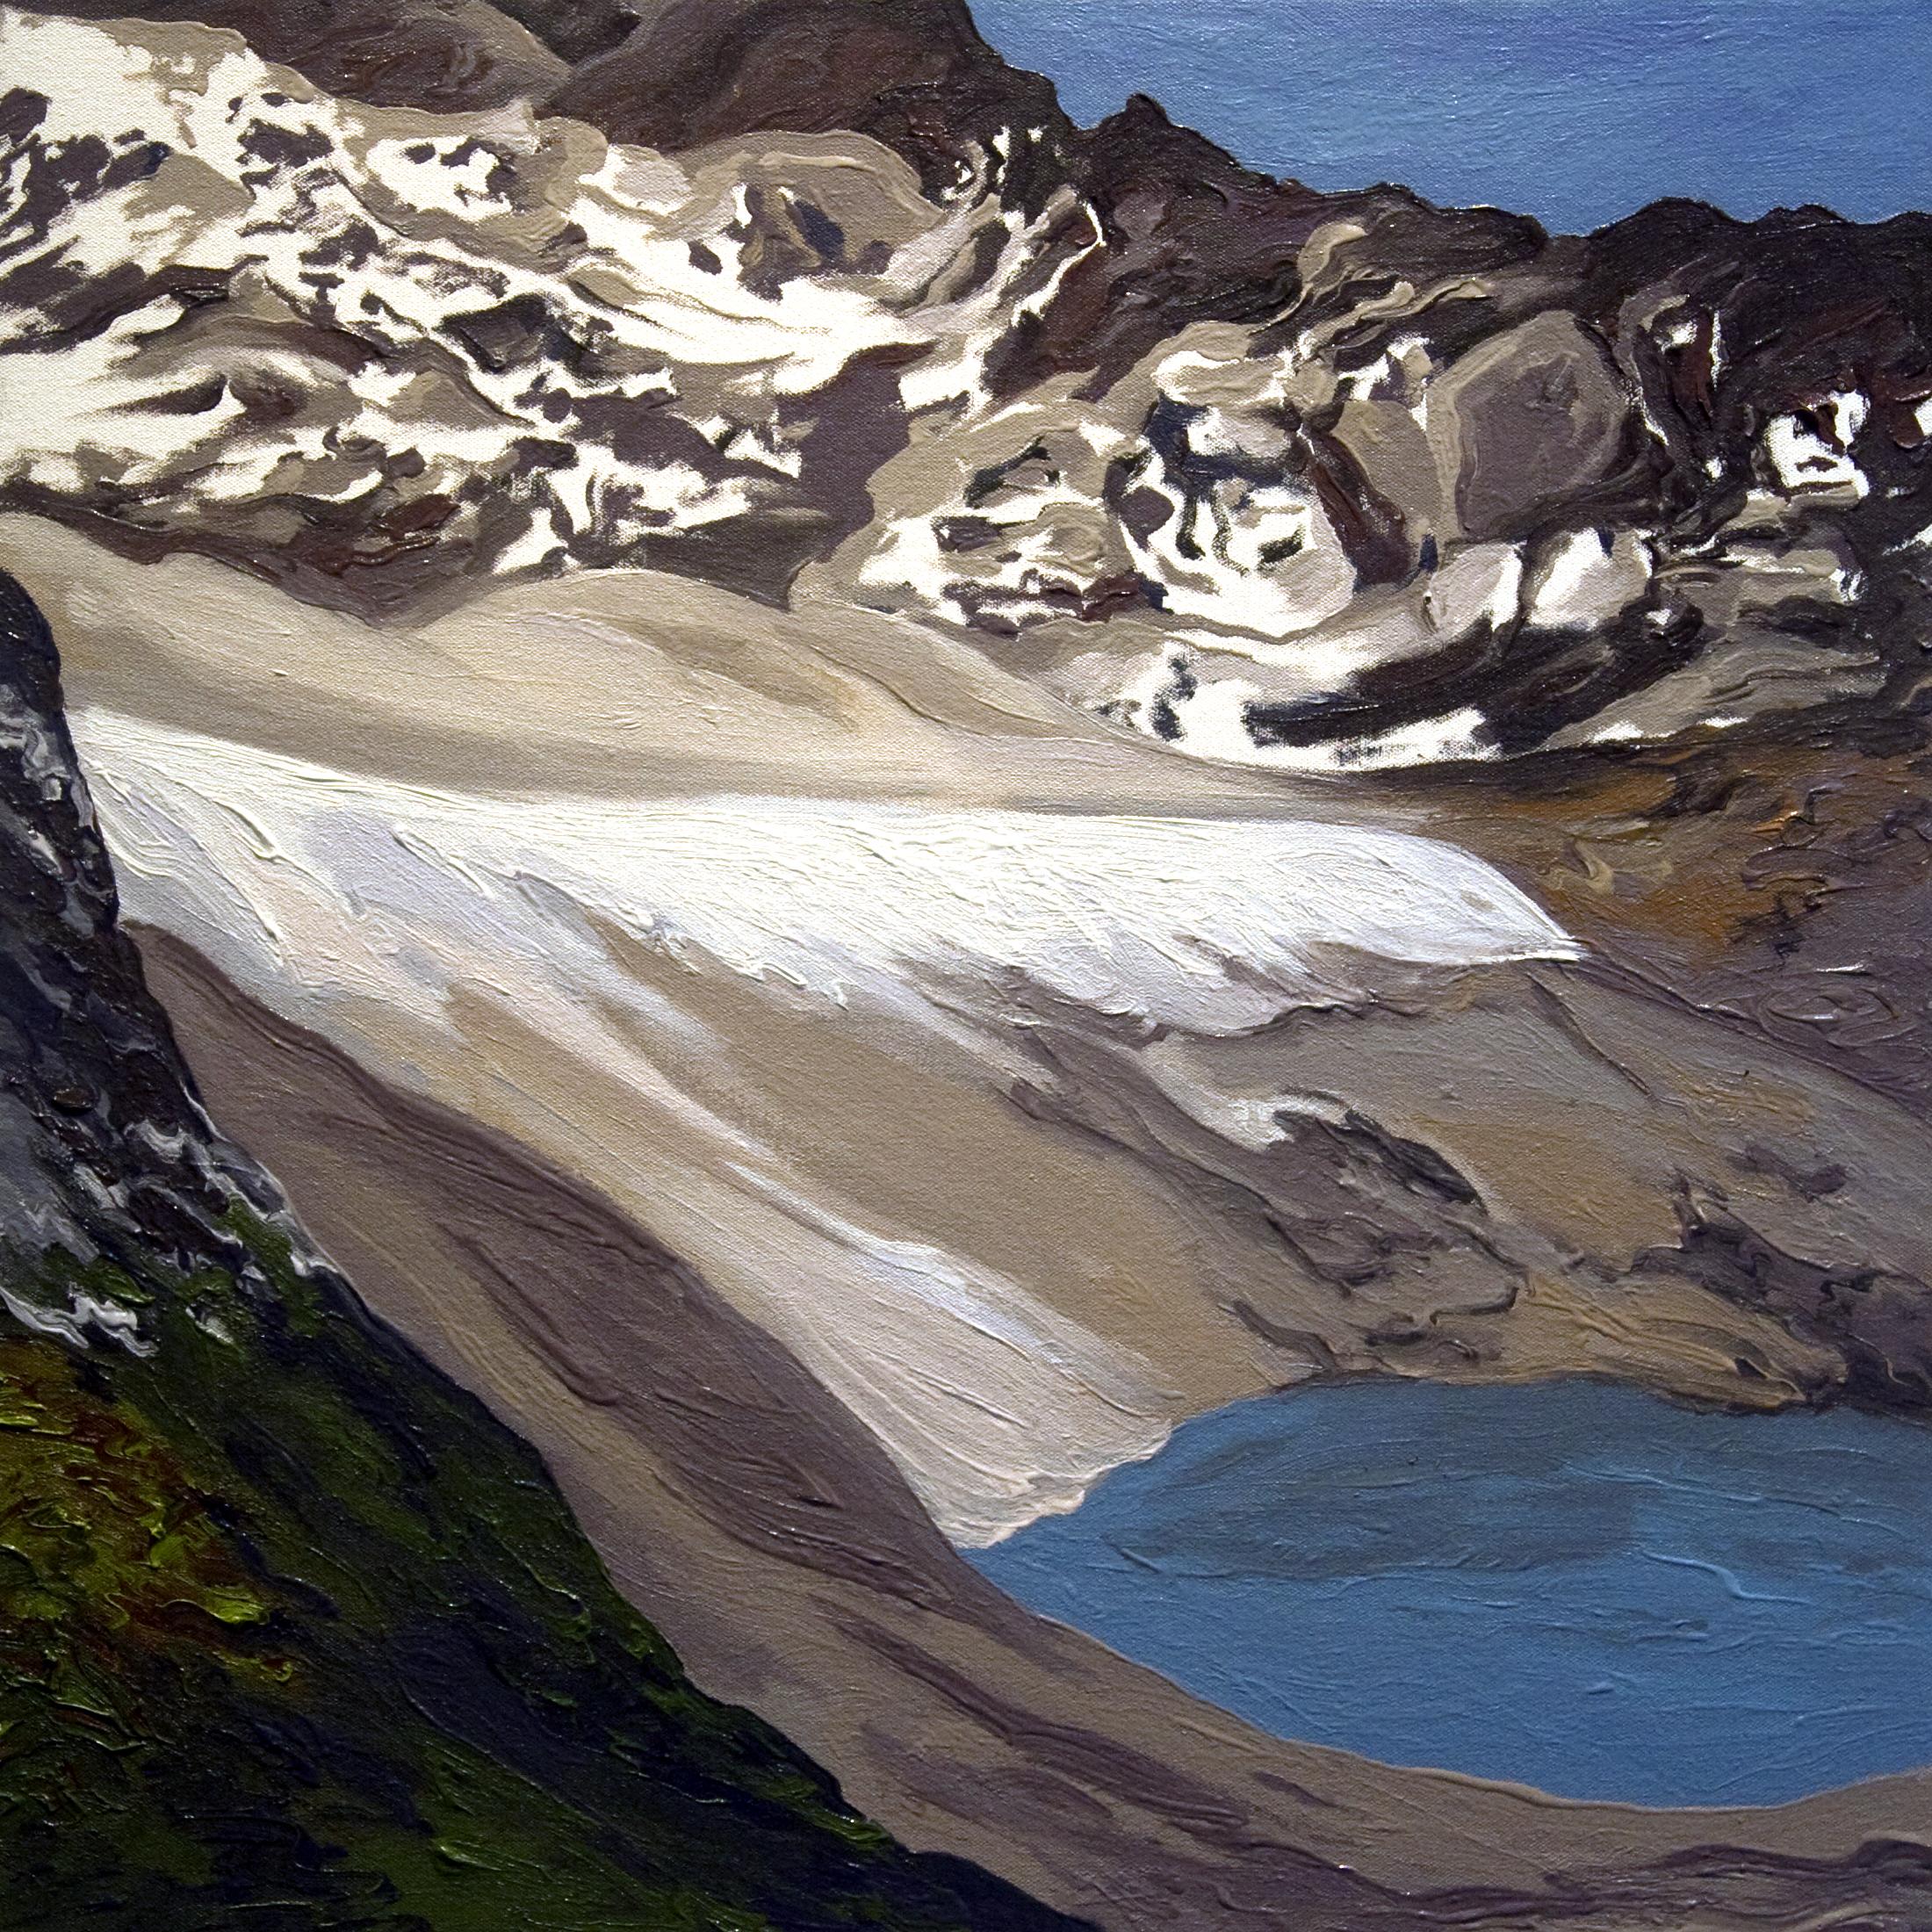 Arapaho Glacier 2002, after Tad Pfeffer